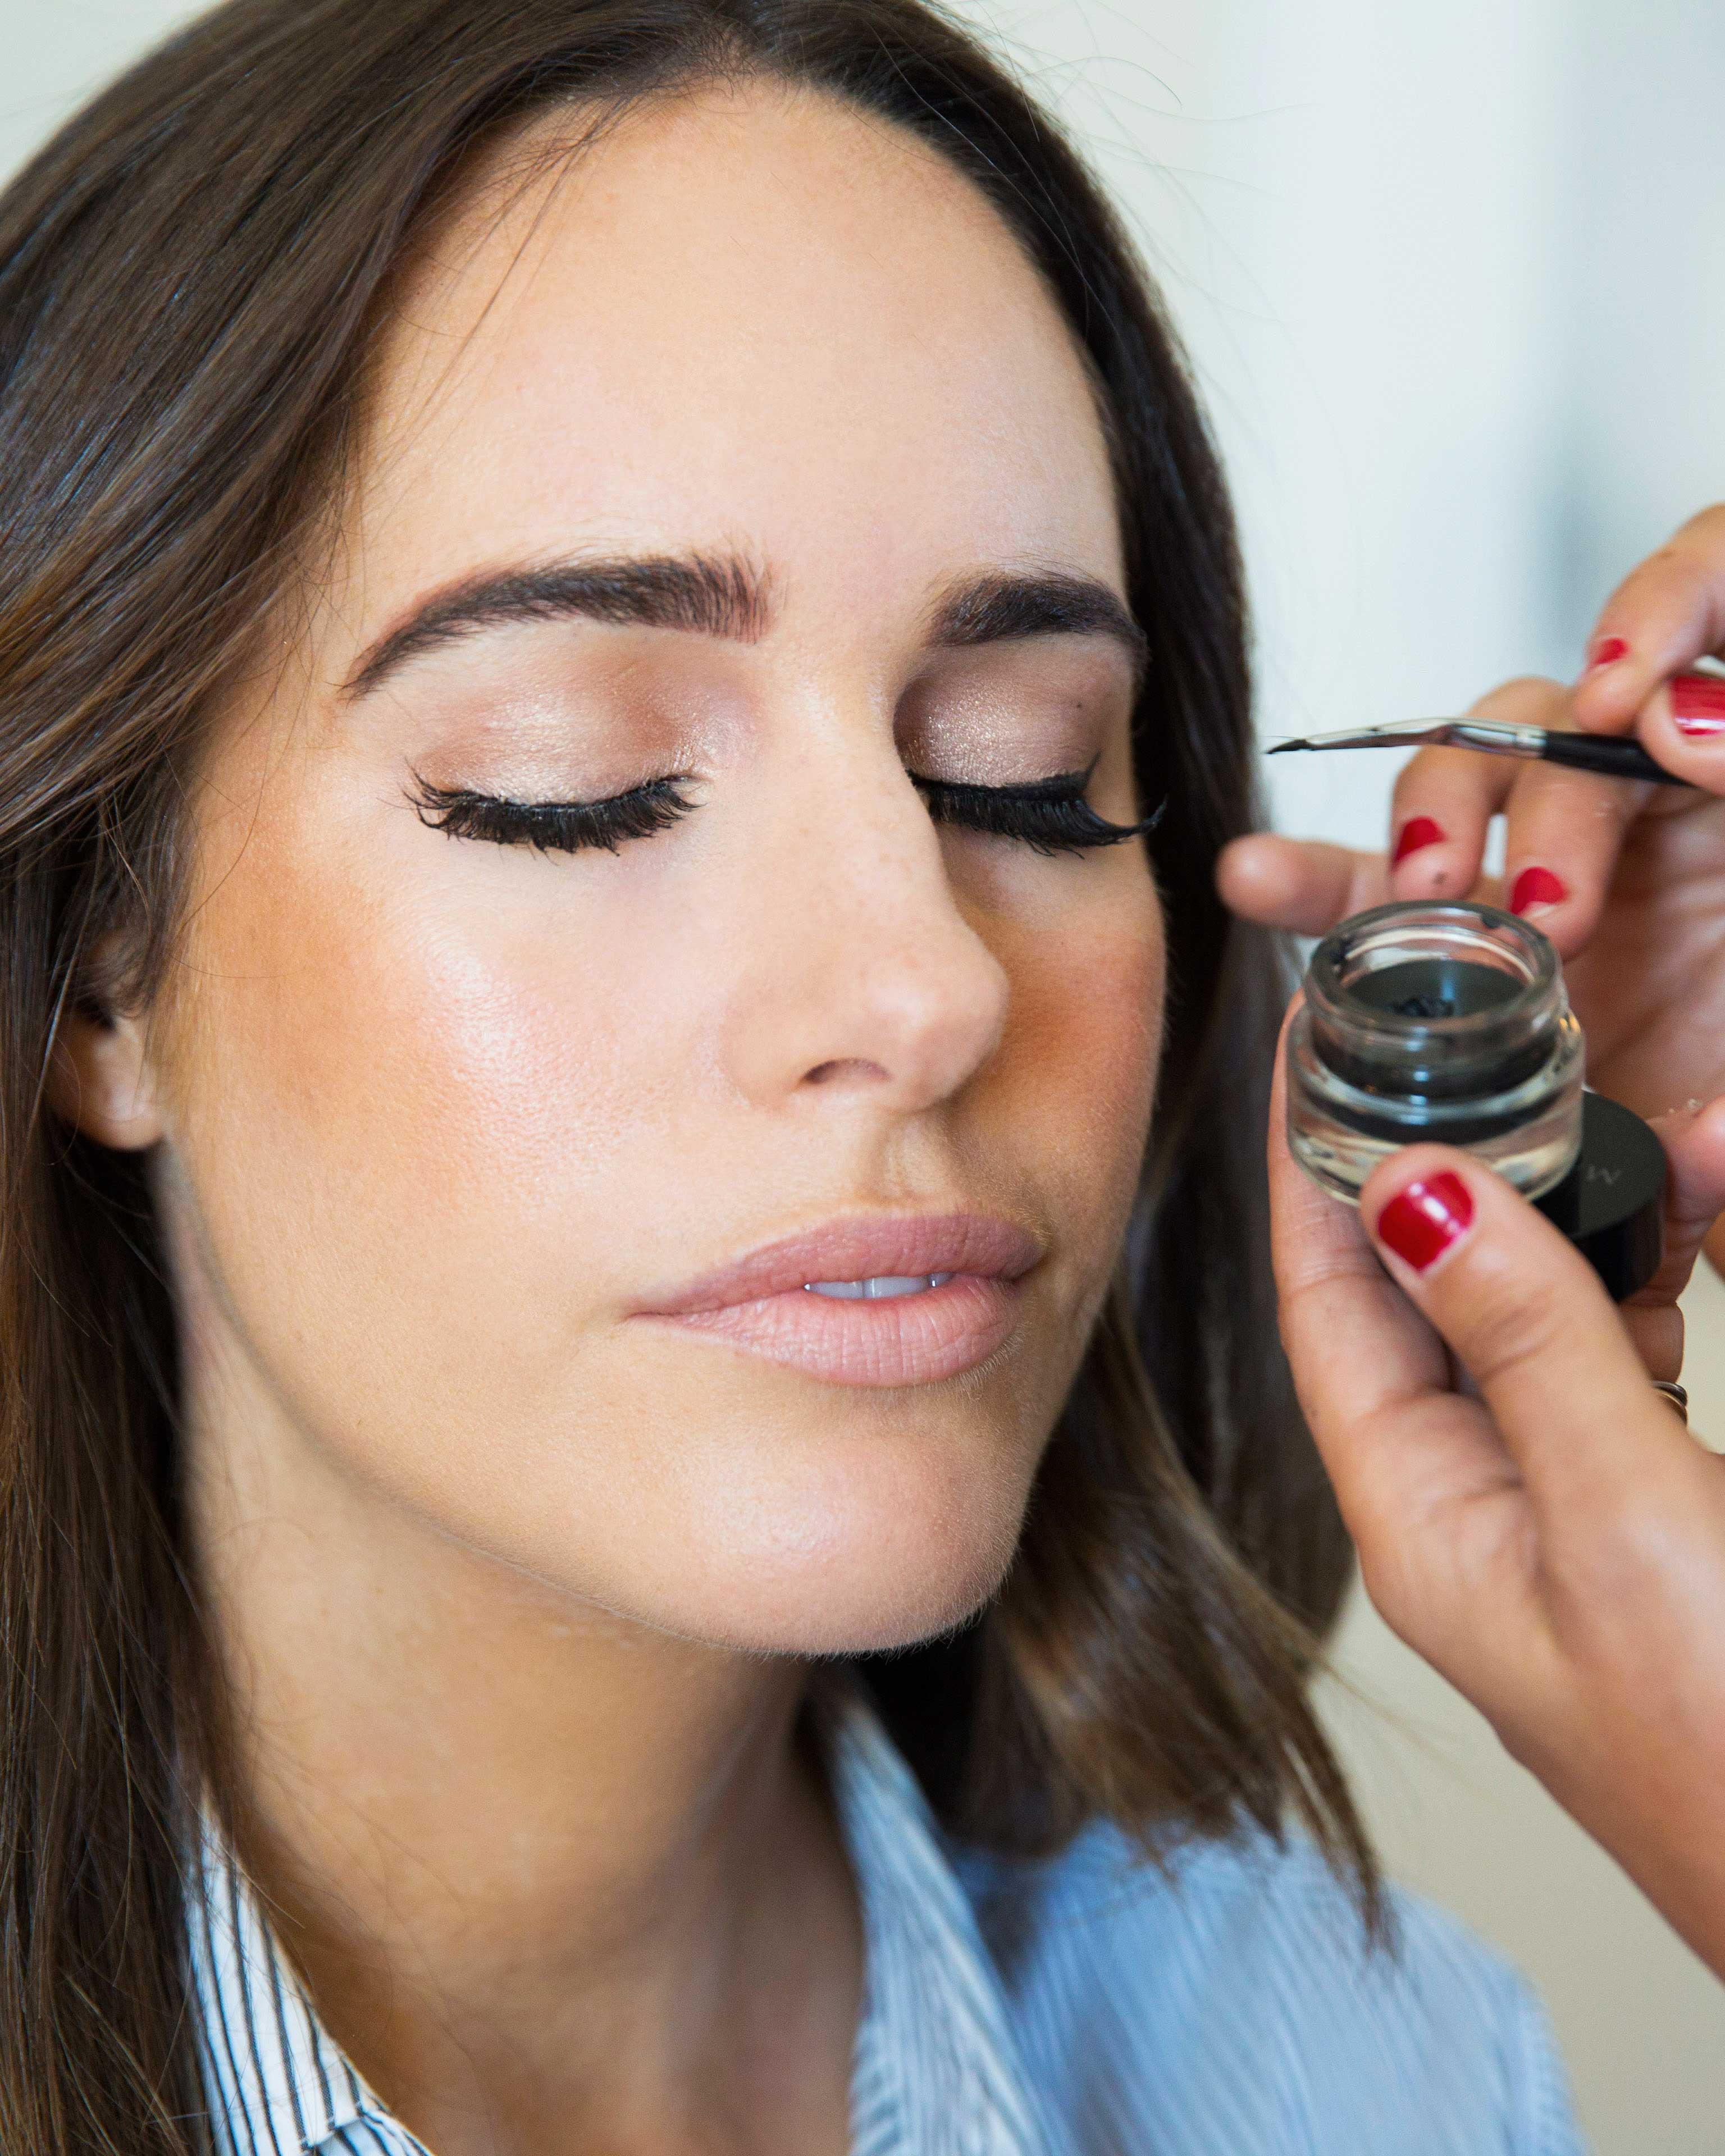 louise roe makeup